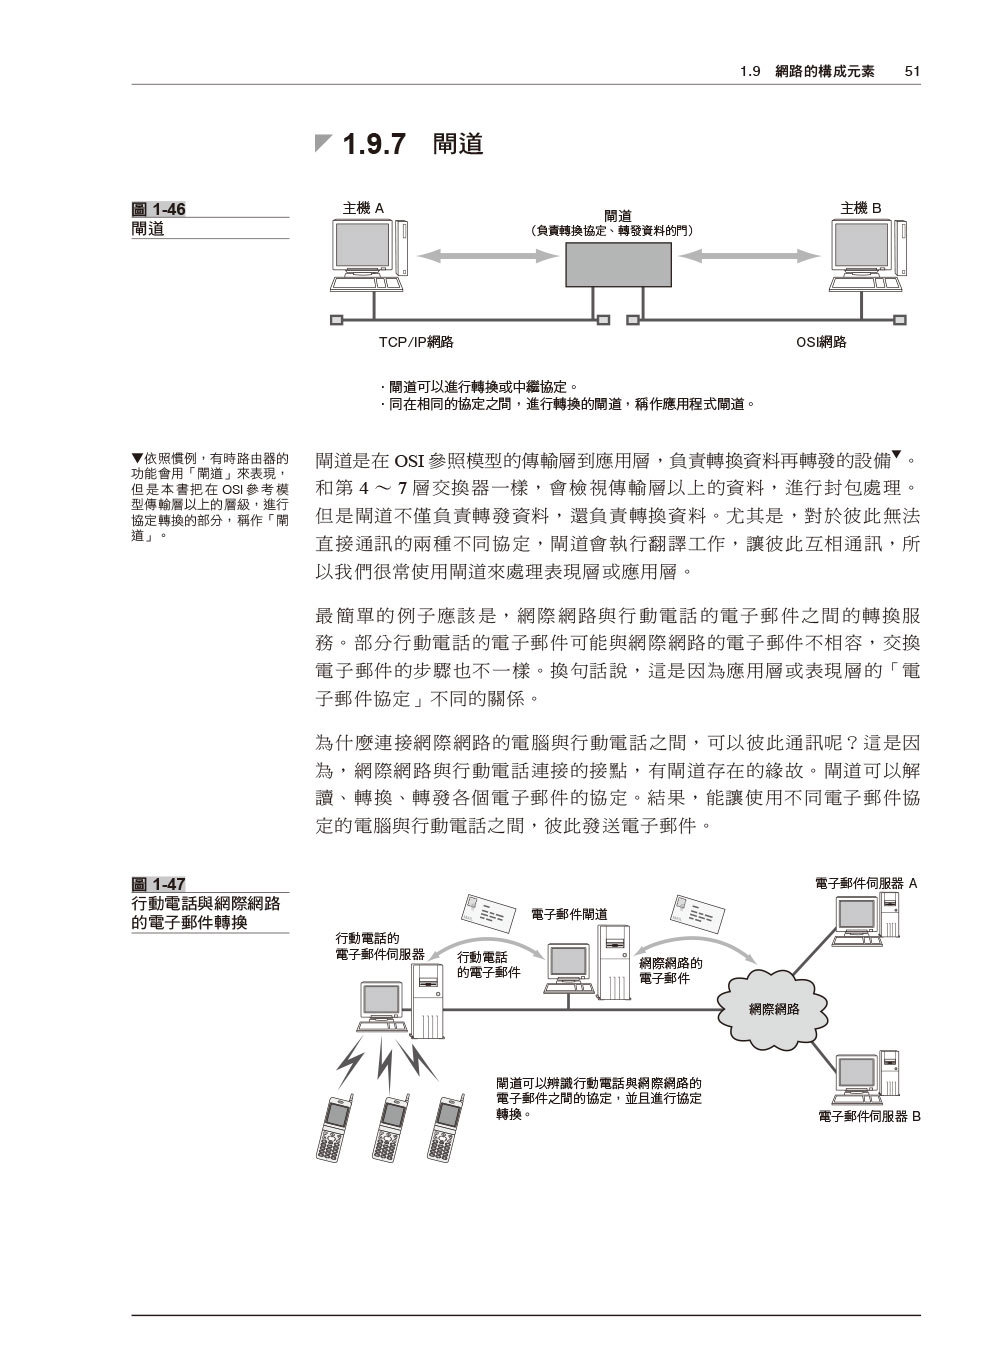 圖解 TCP/IP 網路通訊協定 (涵蓋IPv6)-preview-3